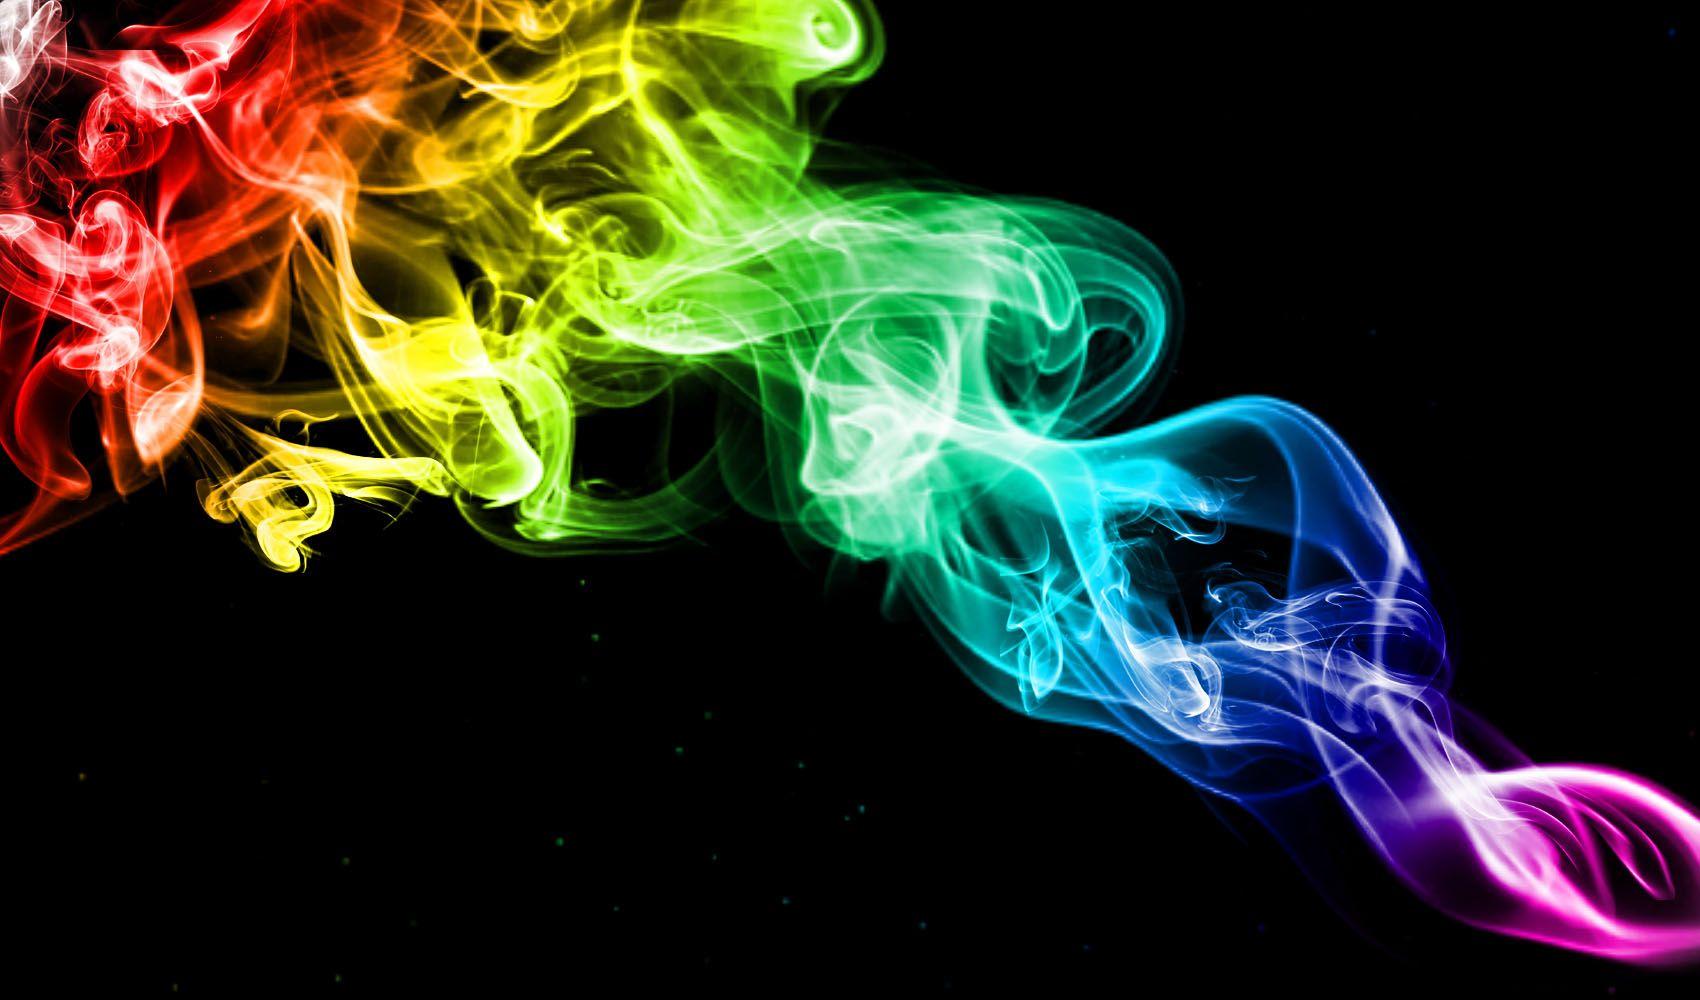 hd wallpaper rainbow smoke | the rainbow connection | pinterest